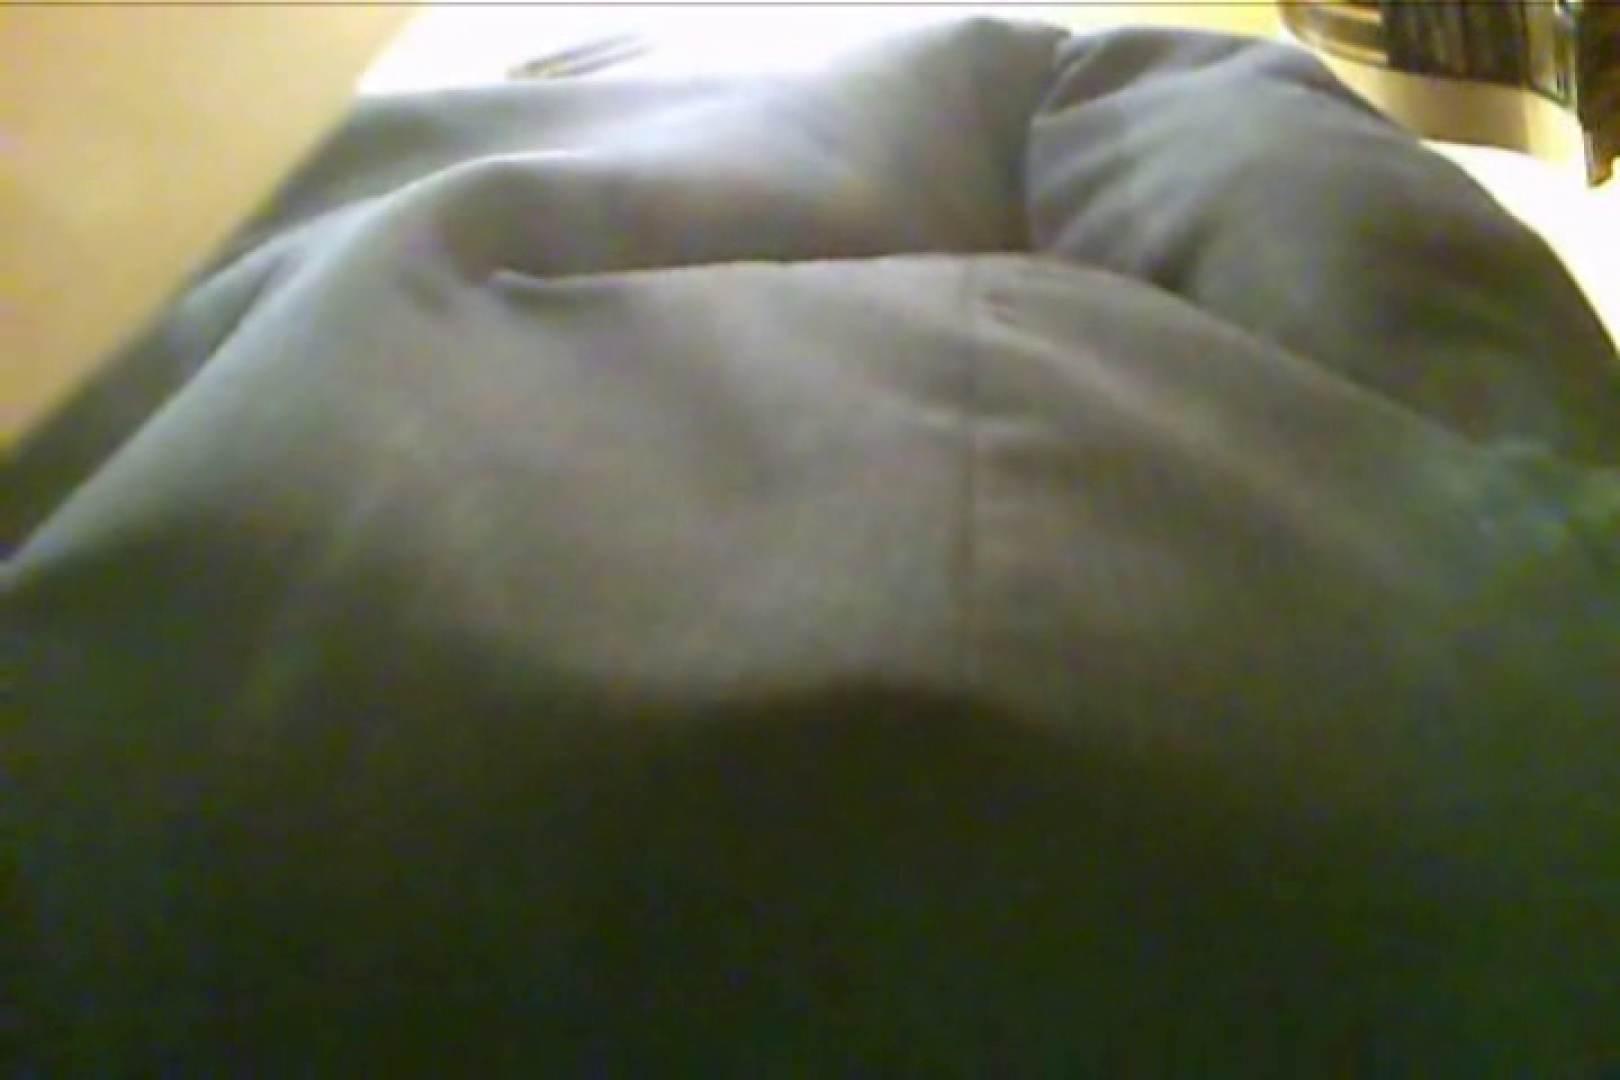 SEASON 2ND!掴み取りさんの洗面所覗き!in新幹線!VOL.06 覗きシーン ゲイ射精画像 87枚 47